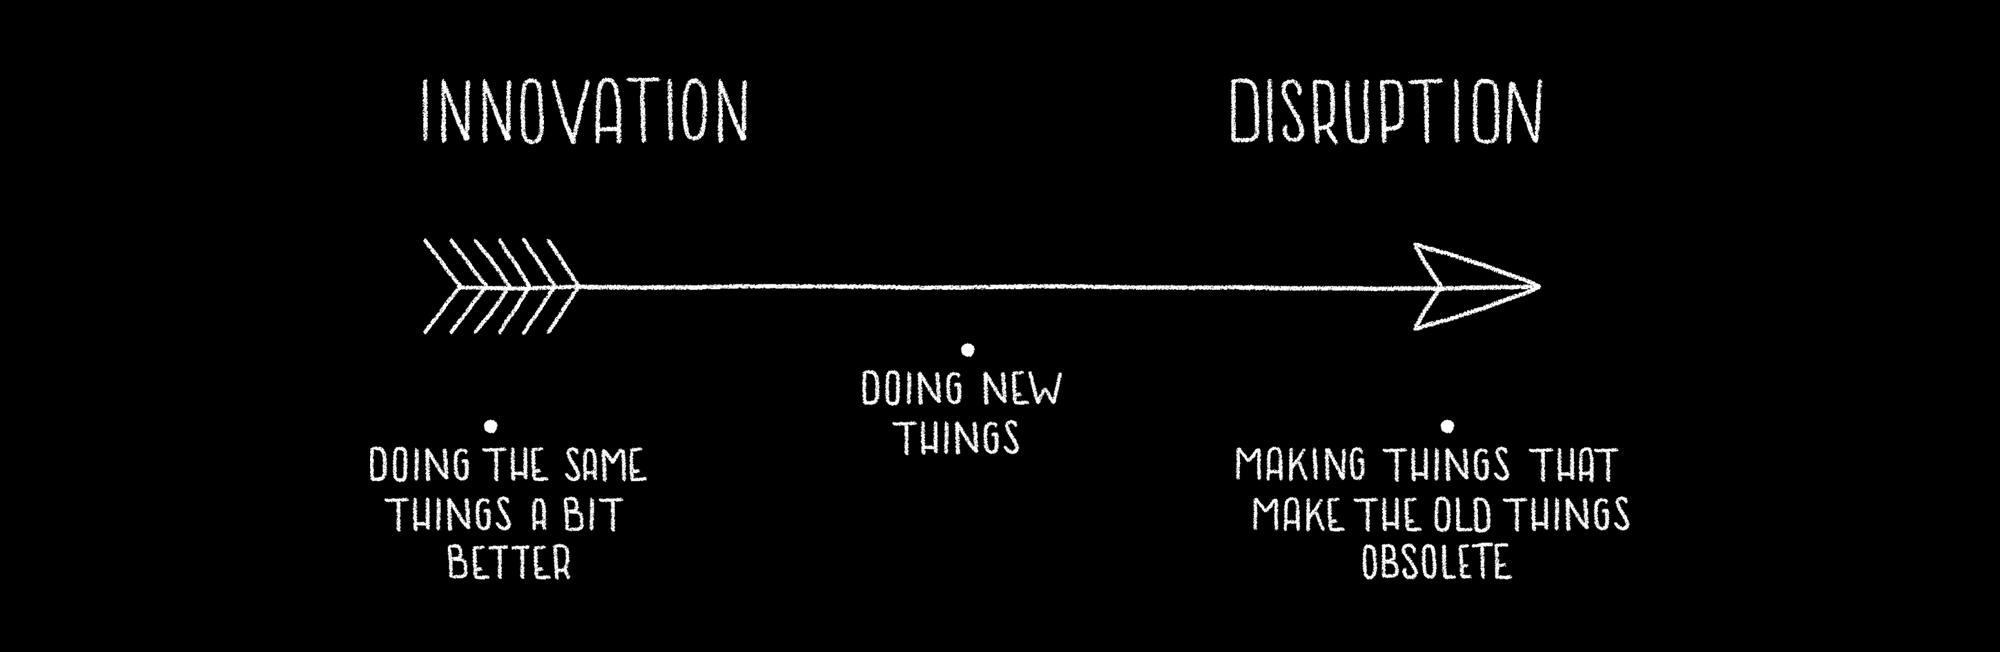 THE DISRUPTIVE DESIGNMETHOD -